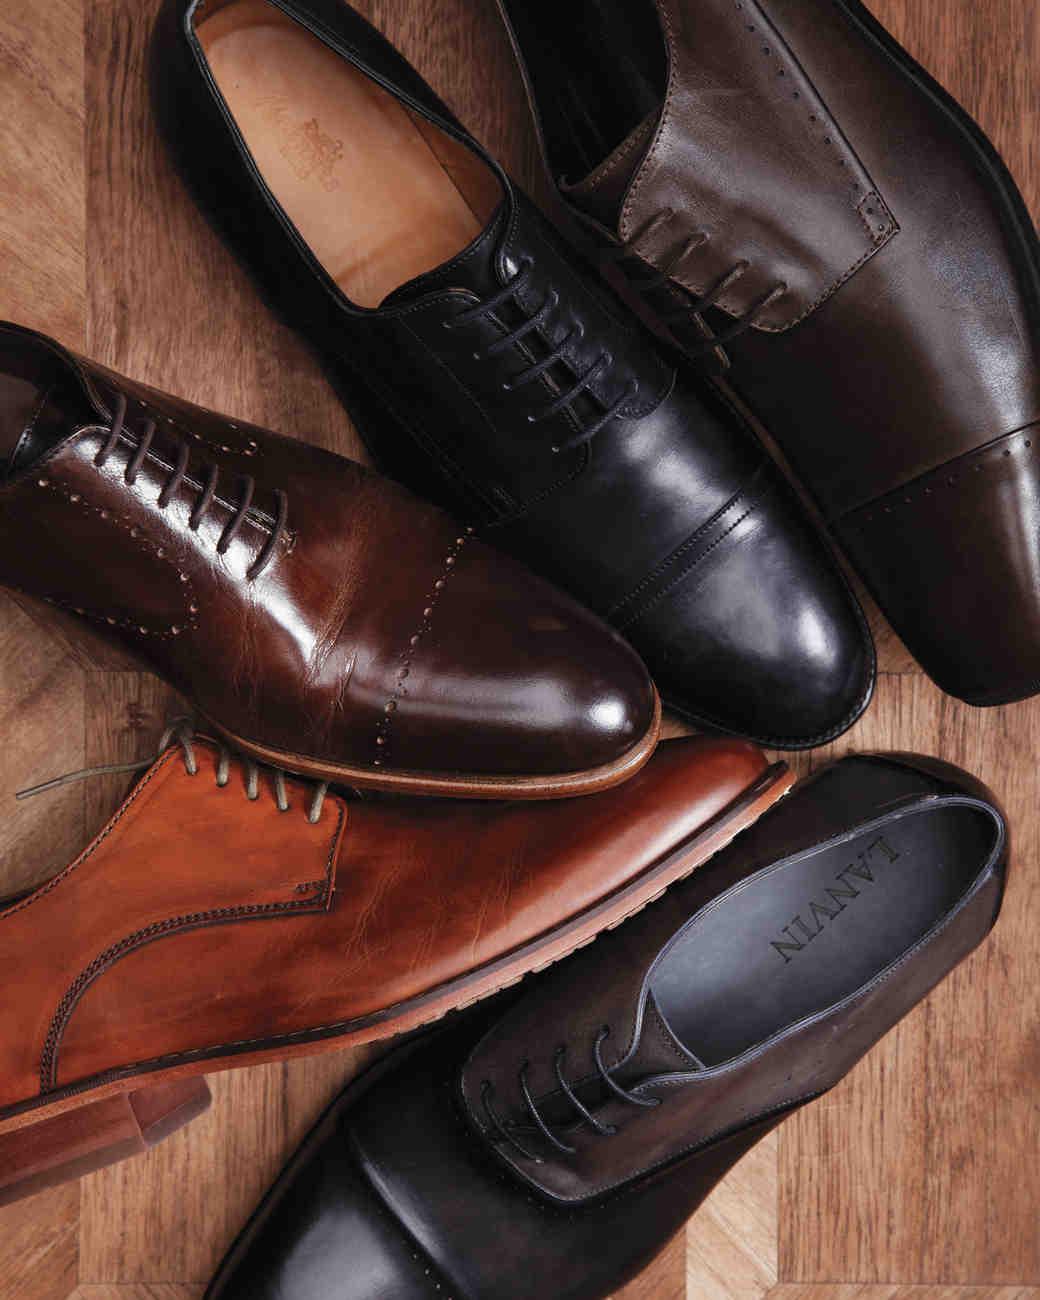 shoes-2-mmsw108757.jpg